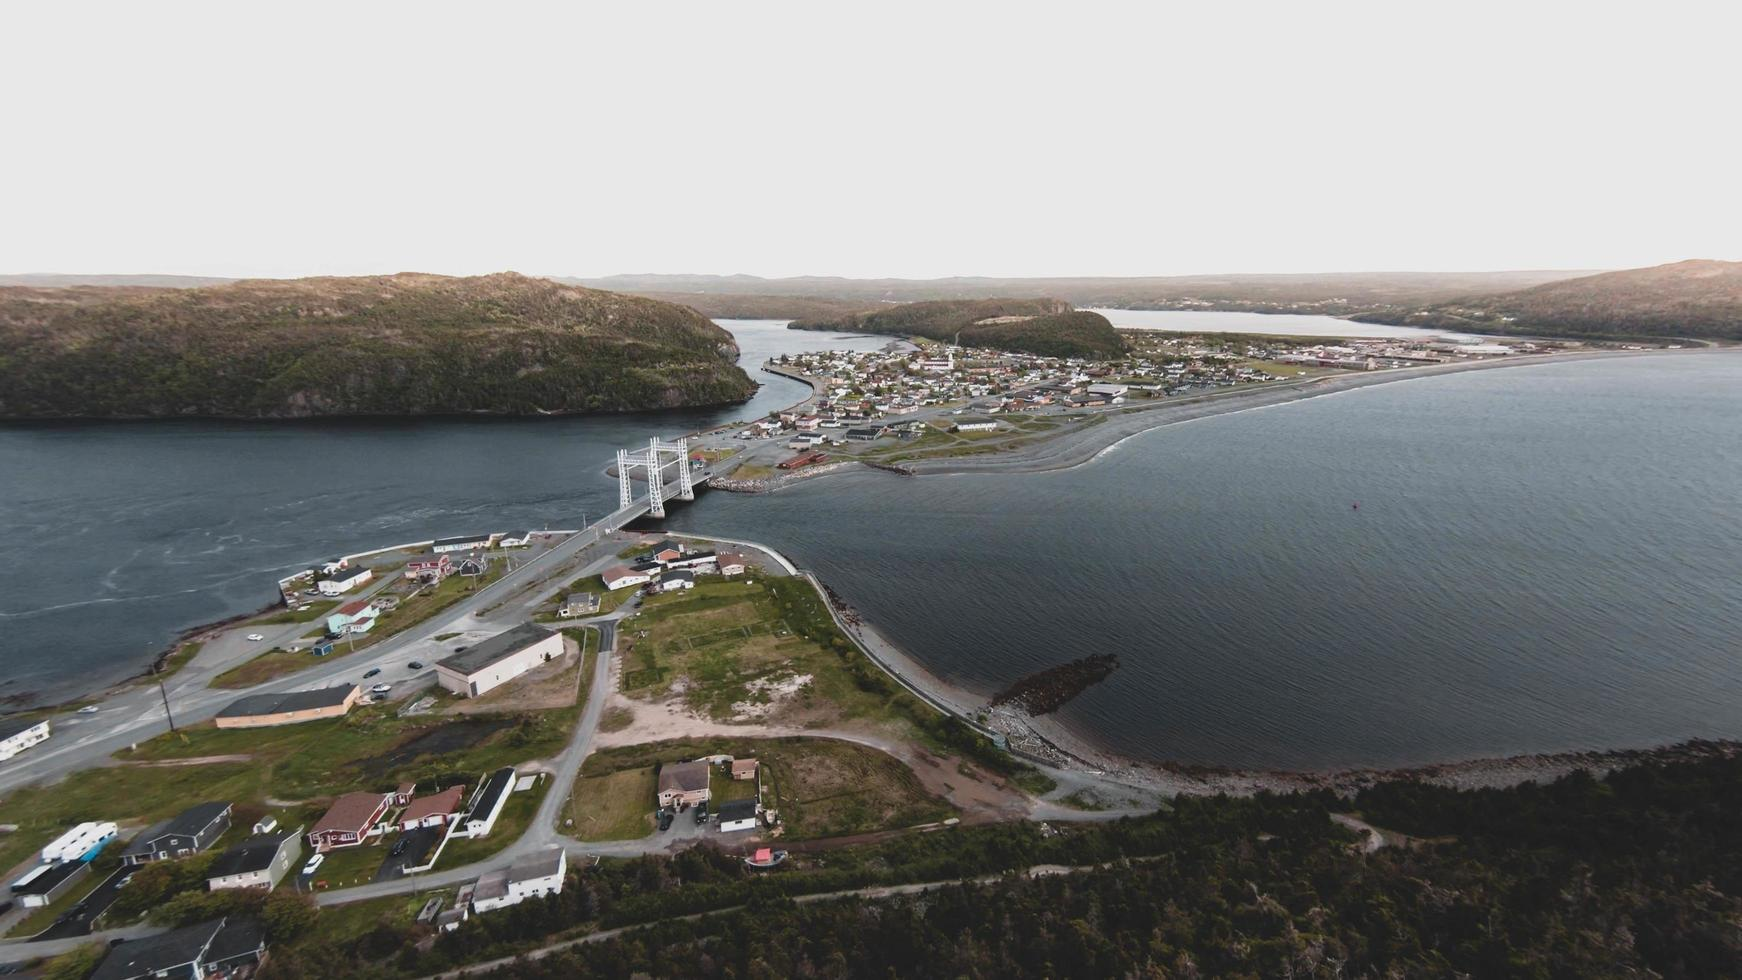 Aerial photo of a bridge